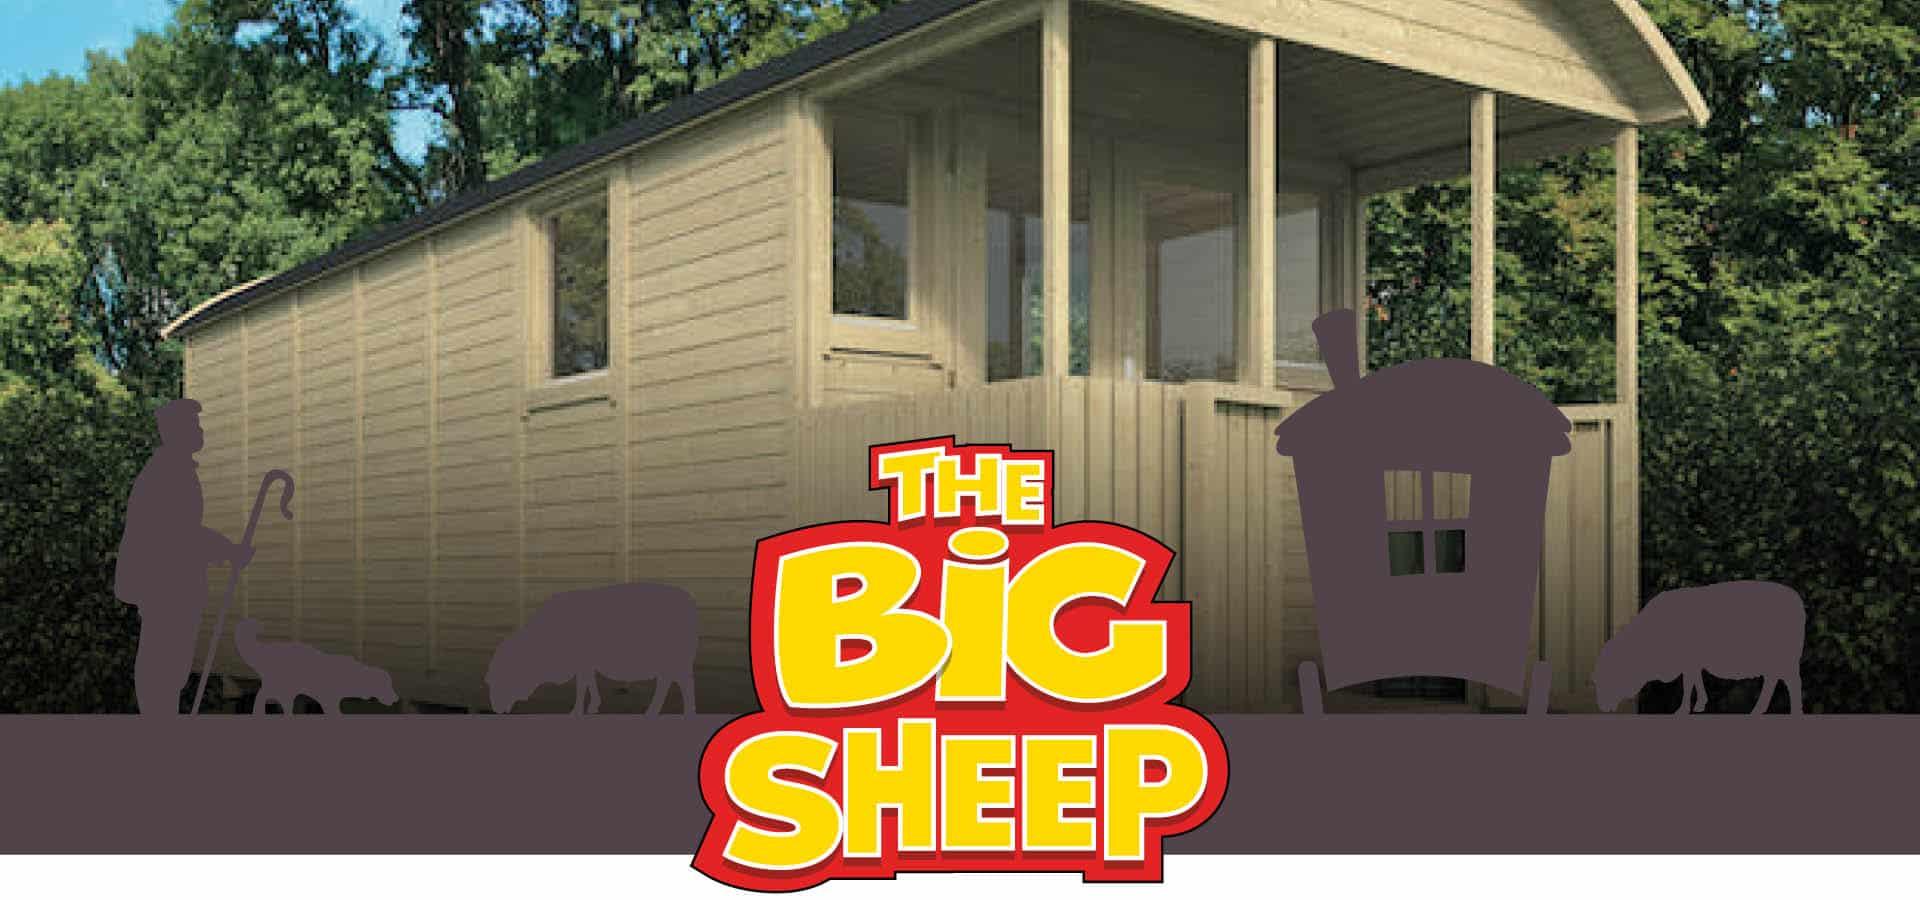 The BIg Sheep Boutique Retreats